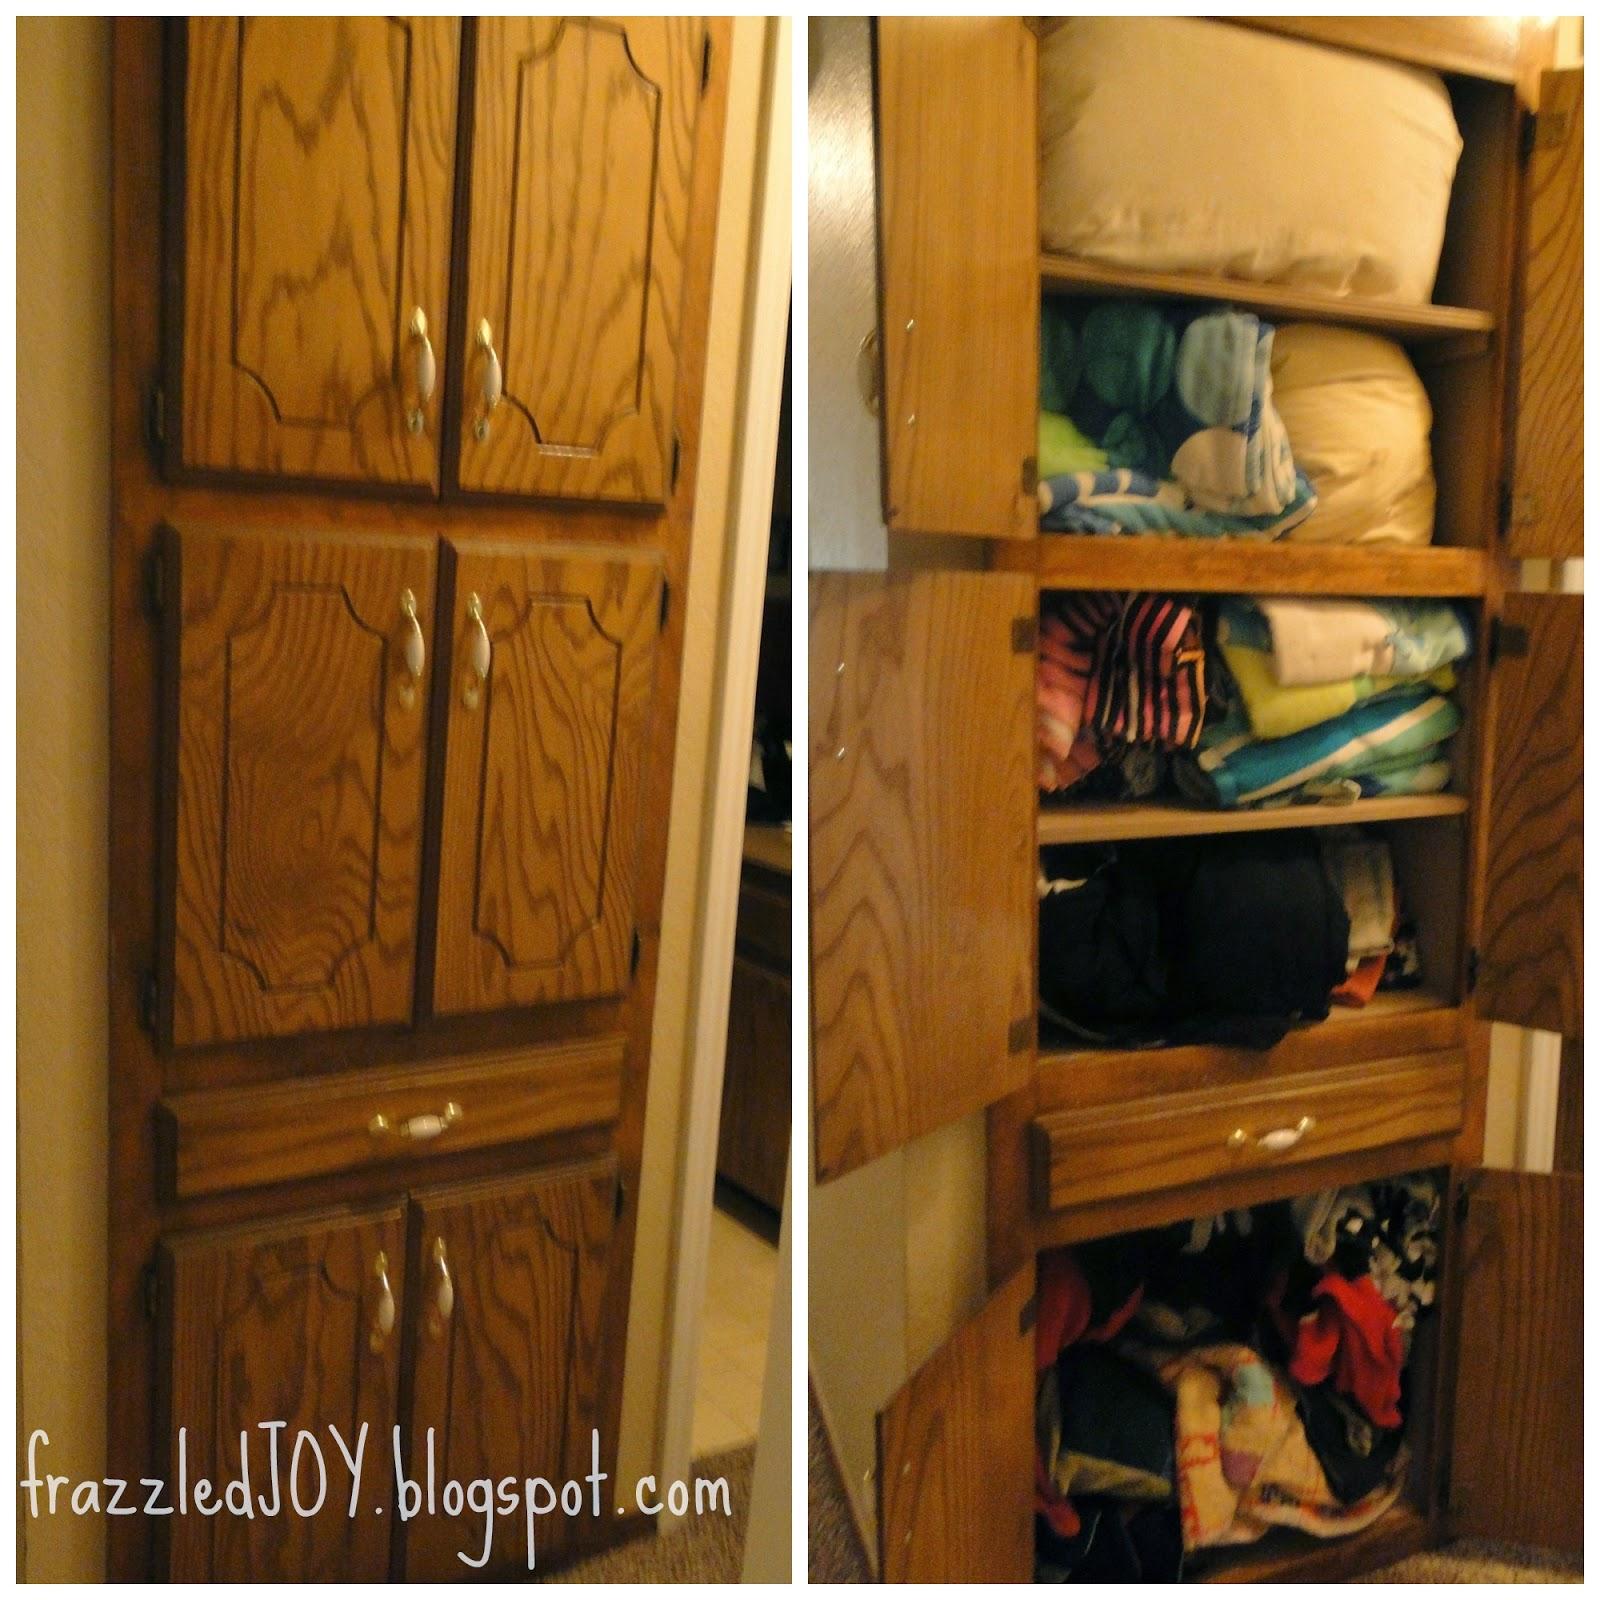 Cramped and unorganized linen closet.